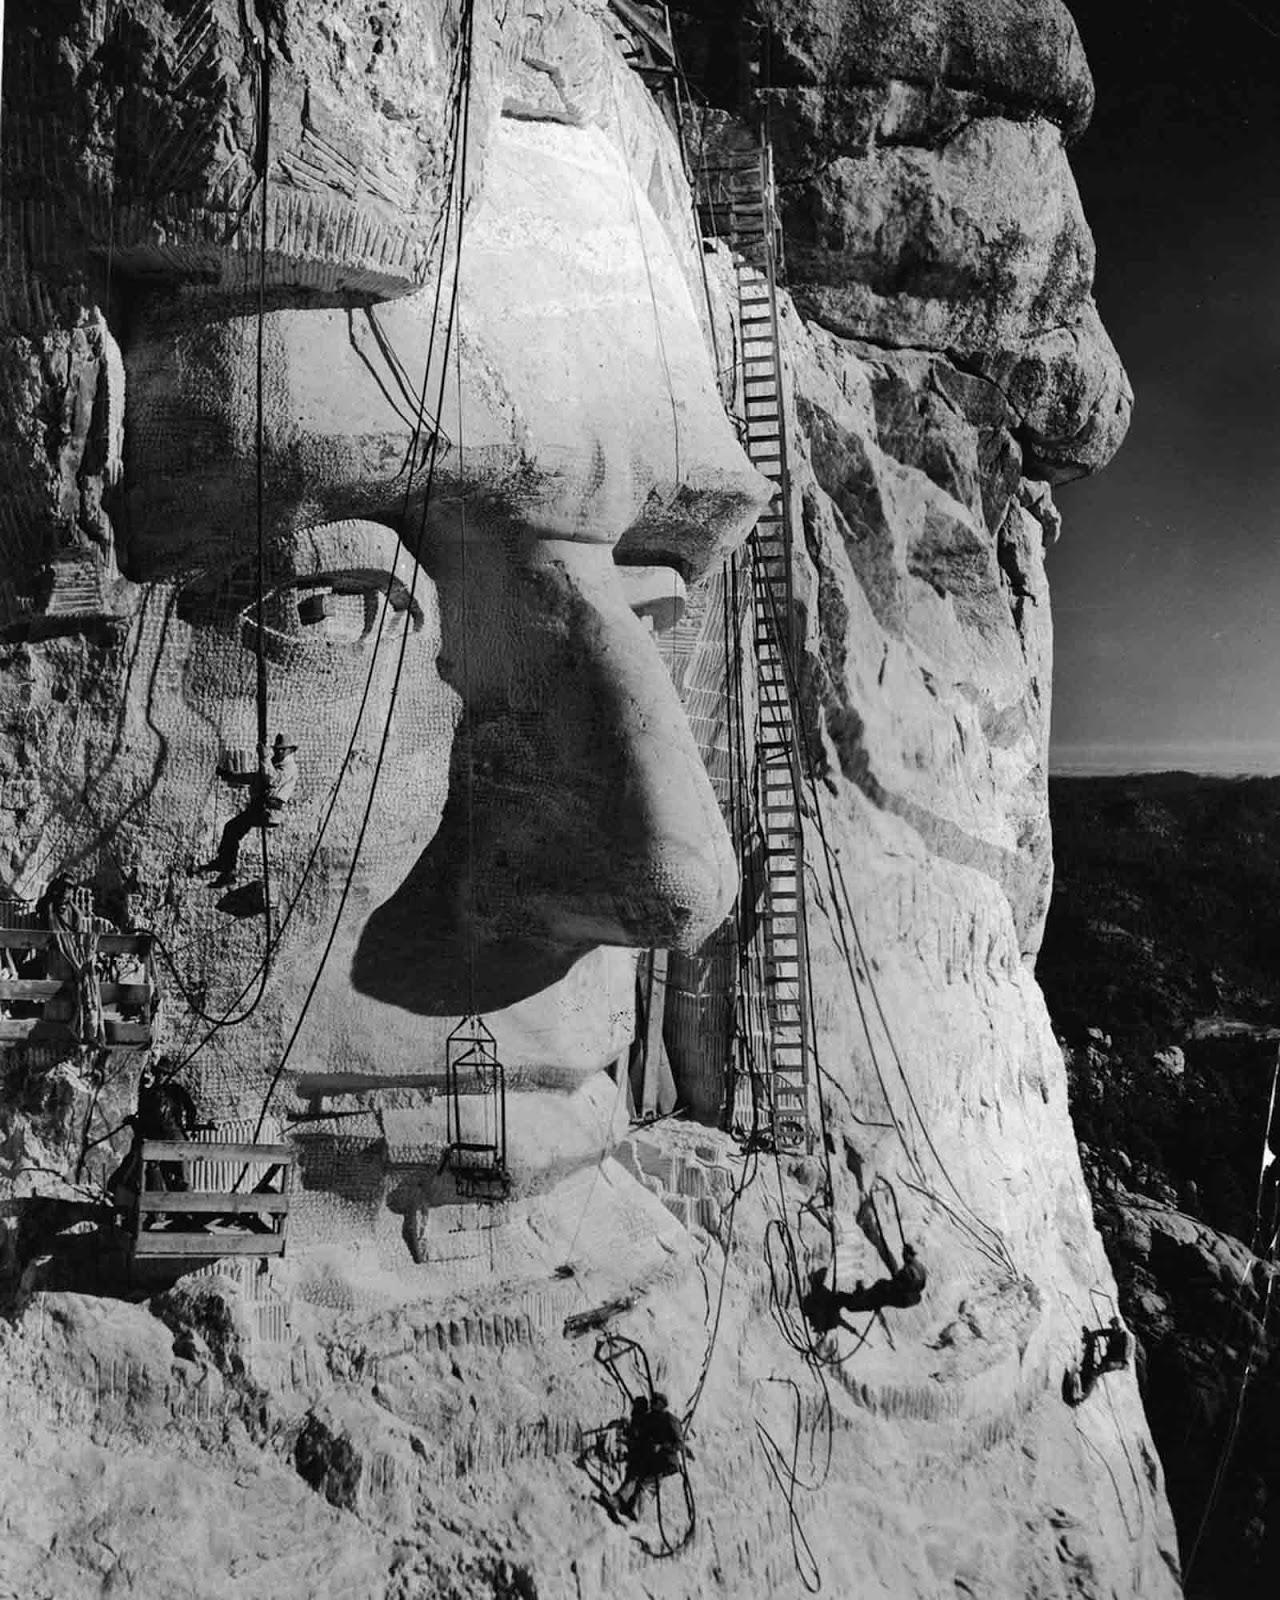 Gutzon Borglum hangs below an eye as his crew works on Abraham Lincoln's head. 1935.